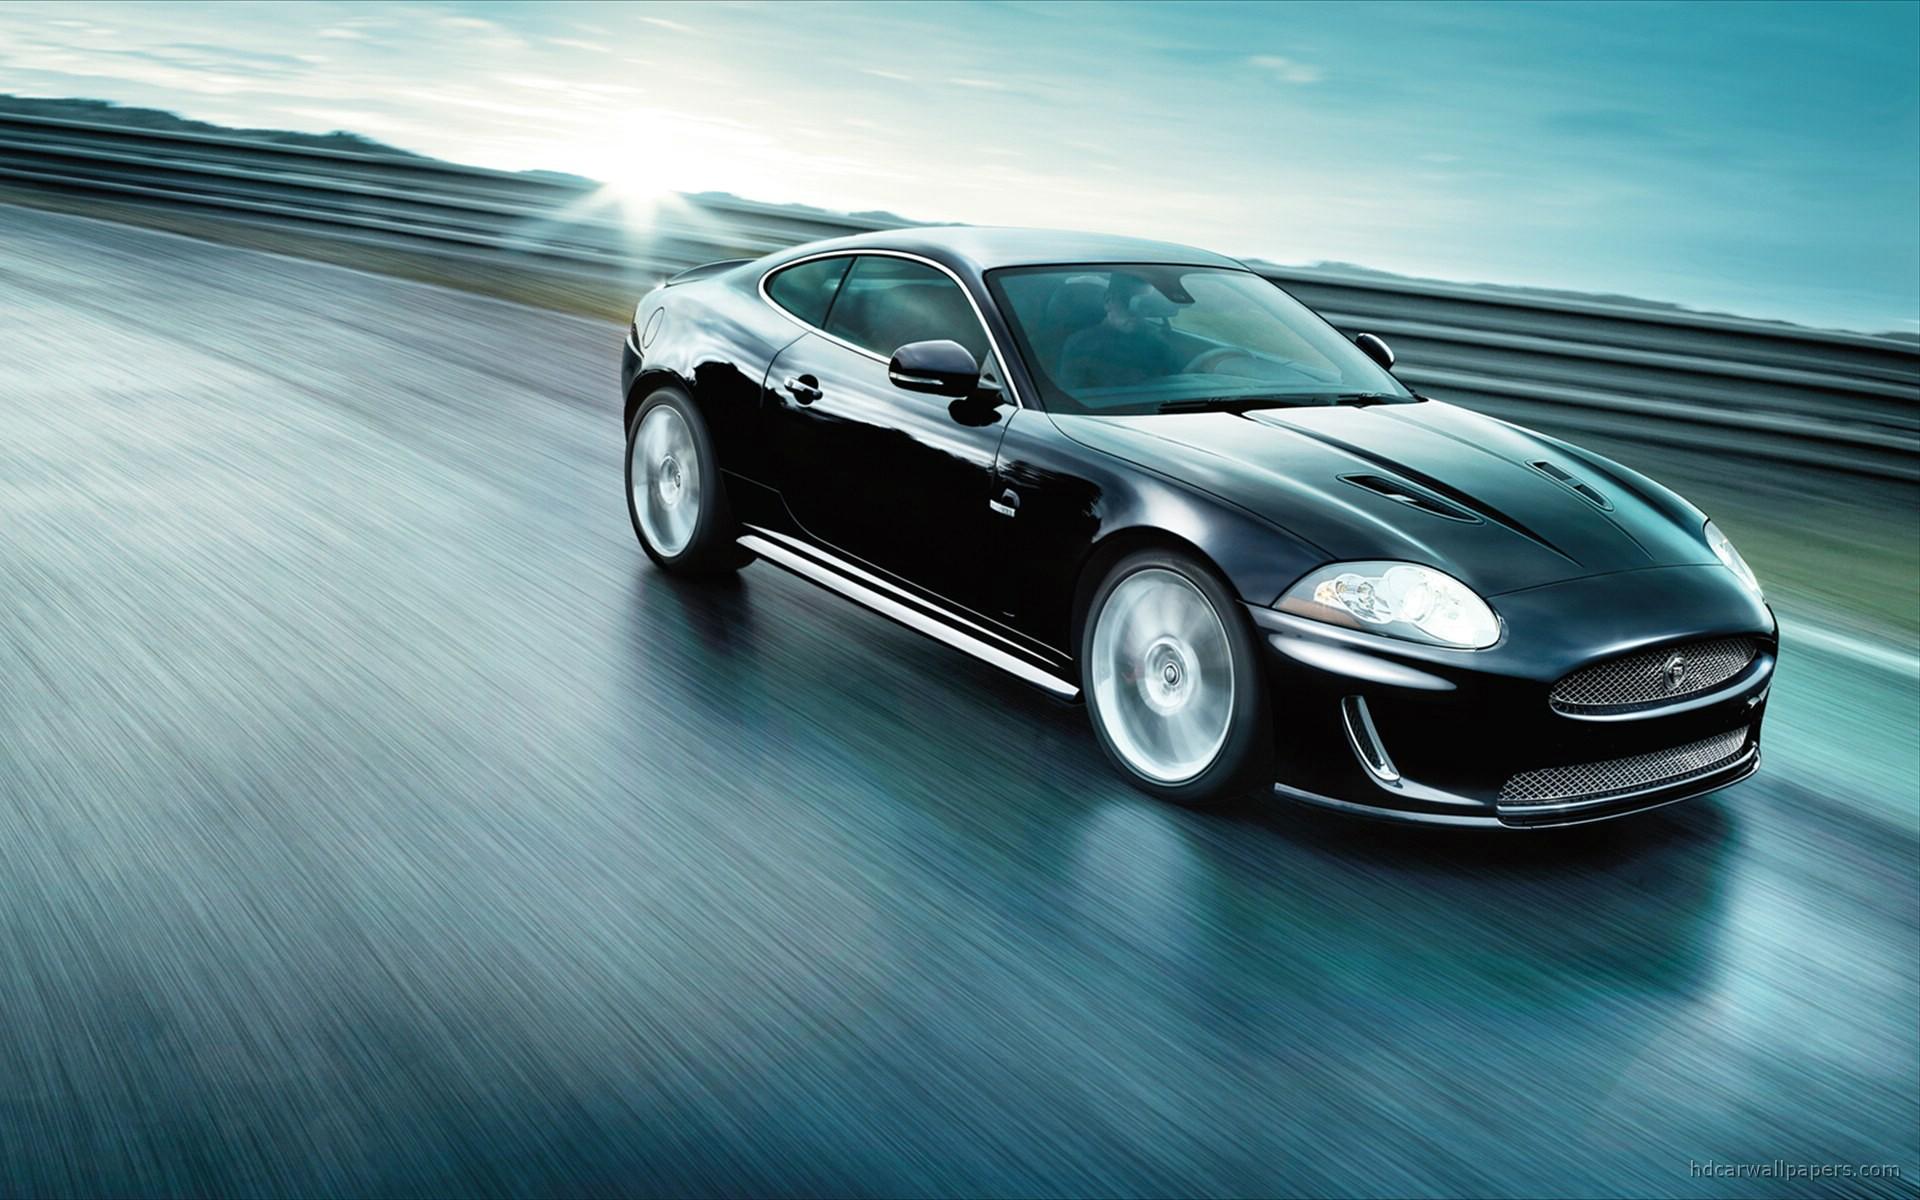 2011 Jaguar Xkr175 Wallpaper  Hd Car Wallpapers  Id #1611